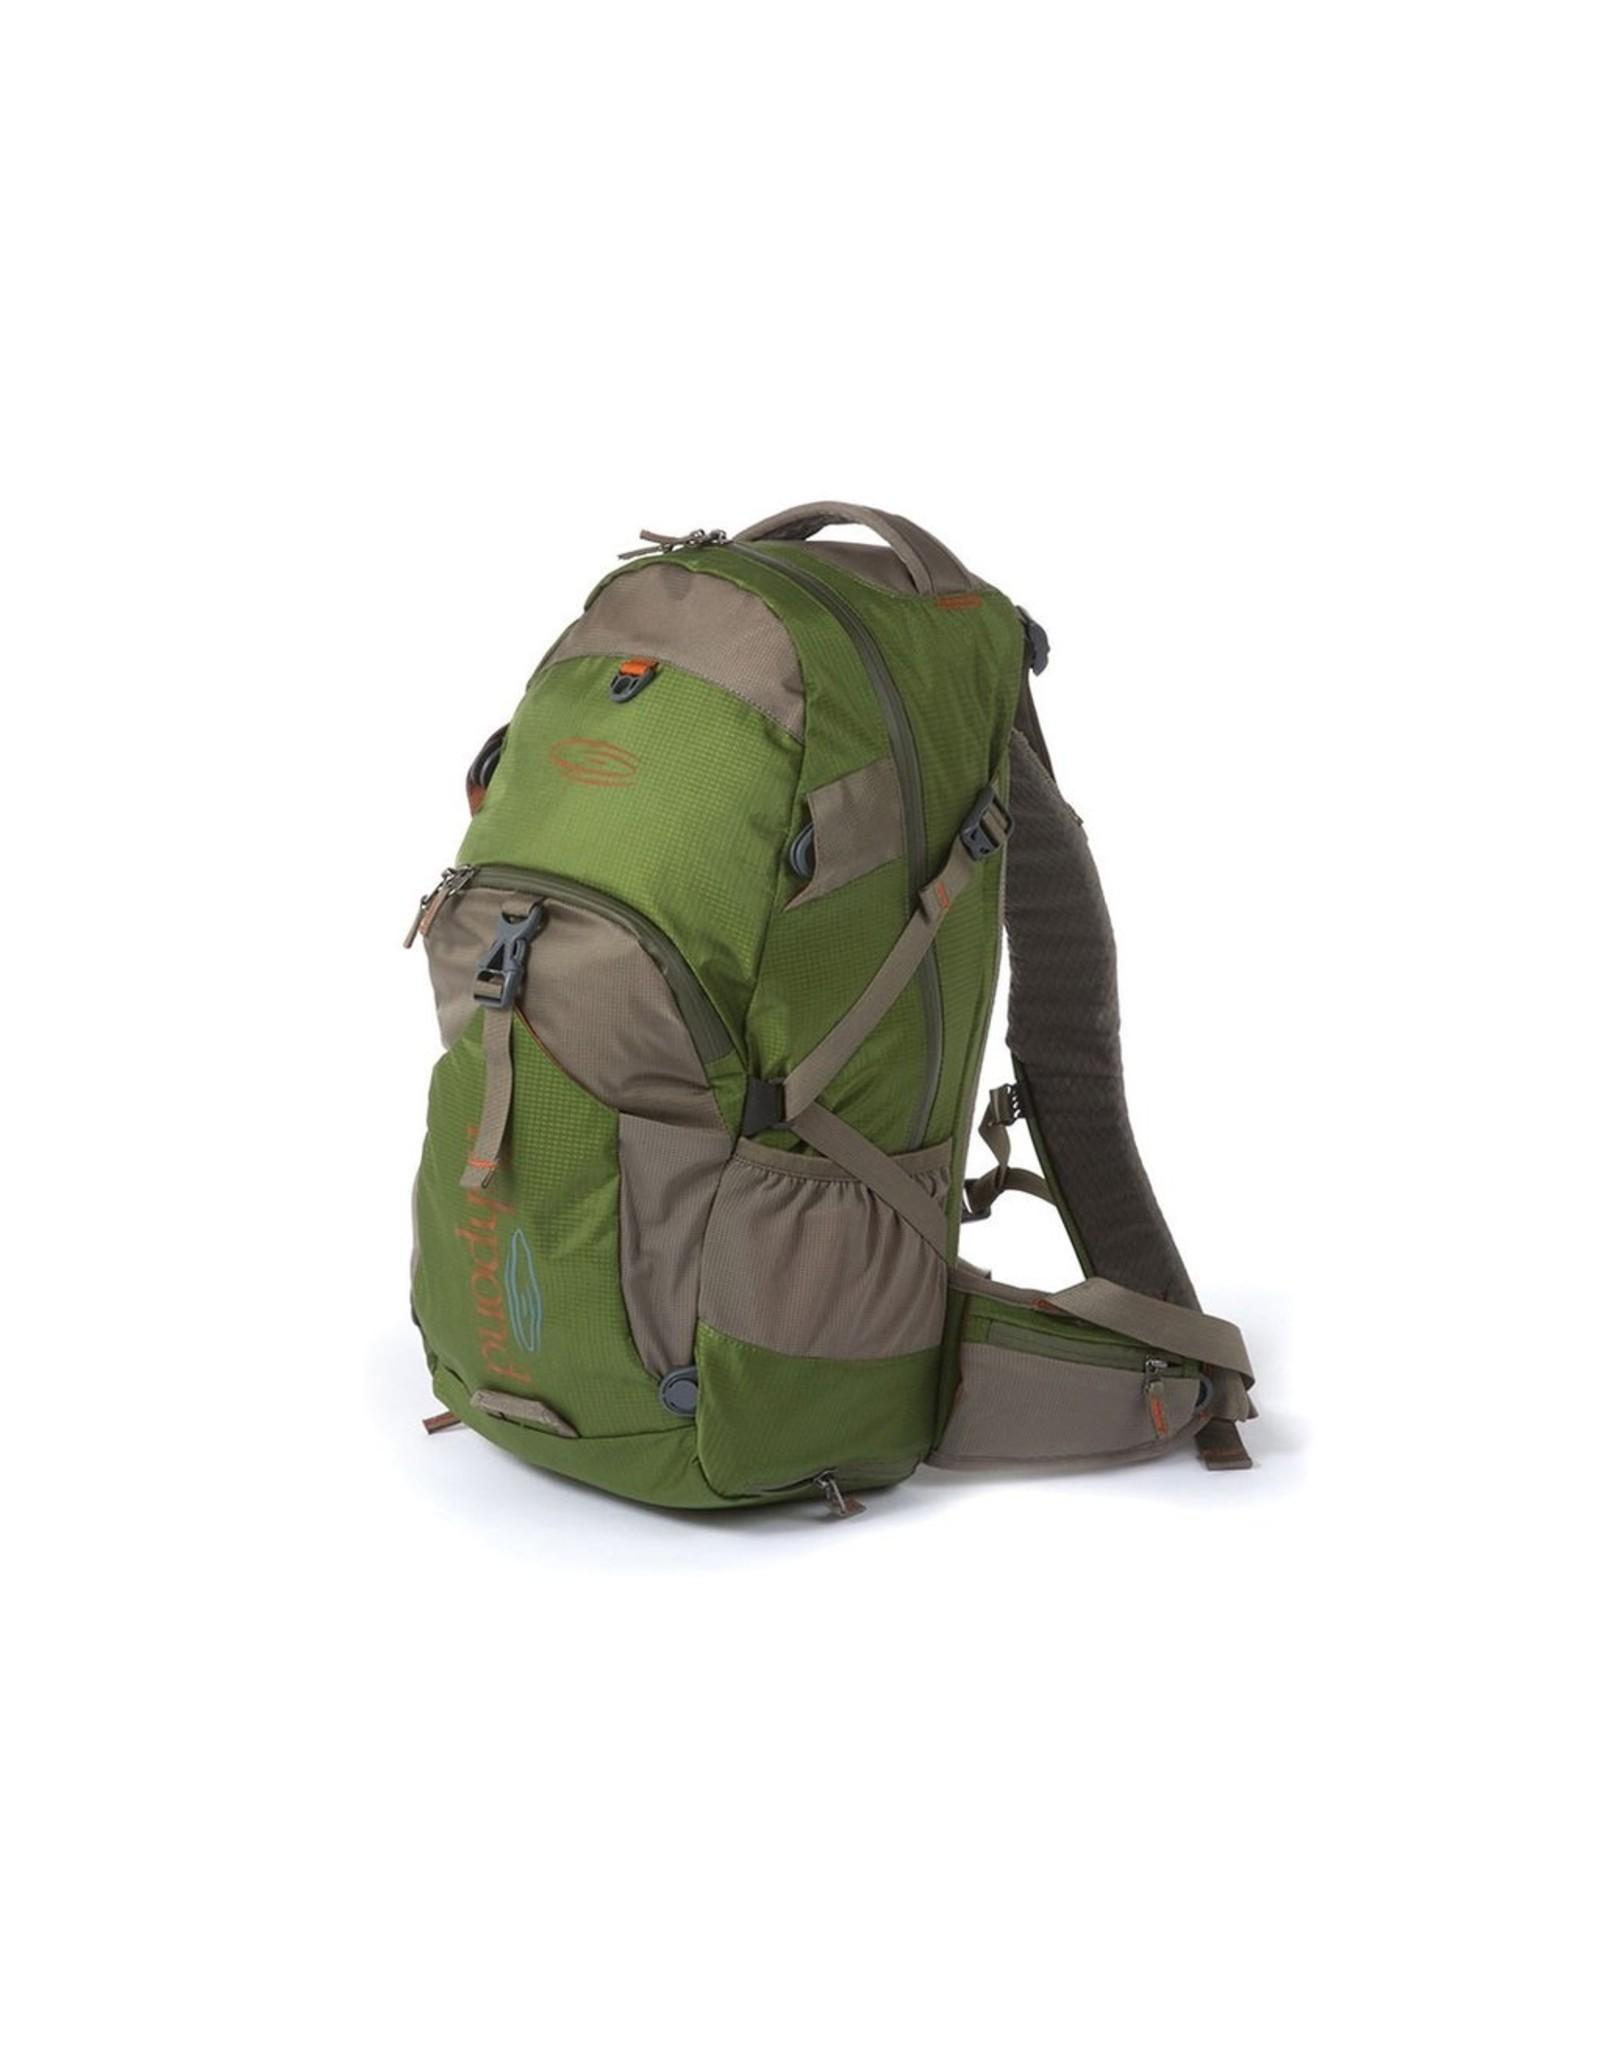 Fishpond Fishpond - Bitch Creek Backpack